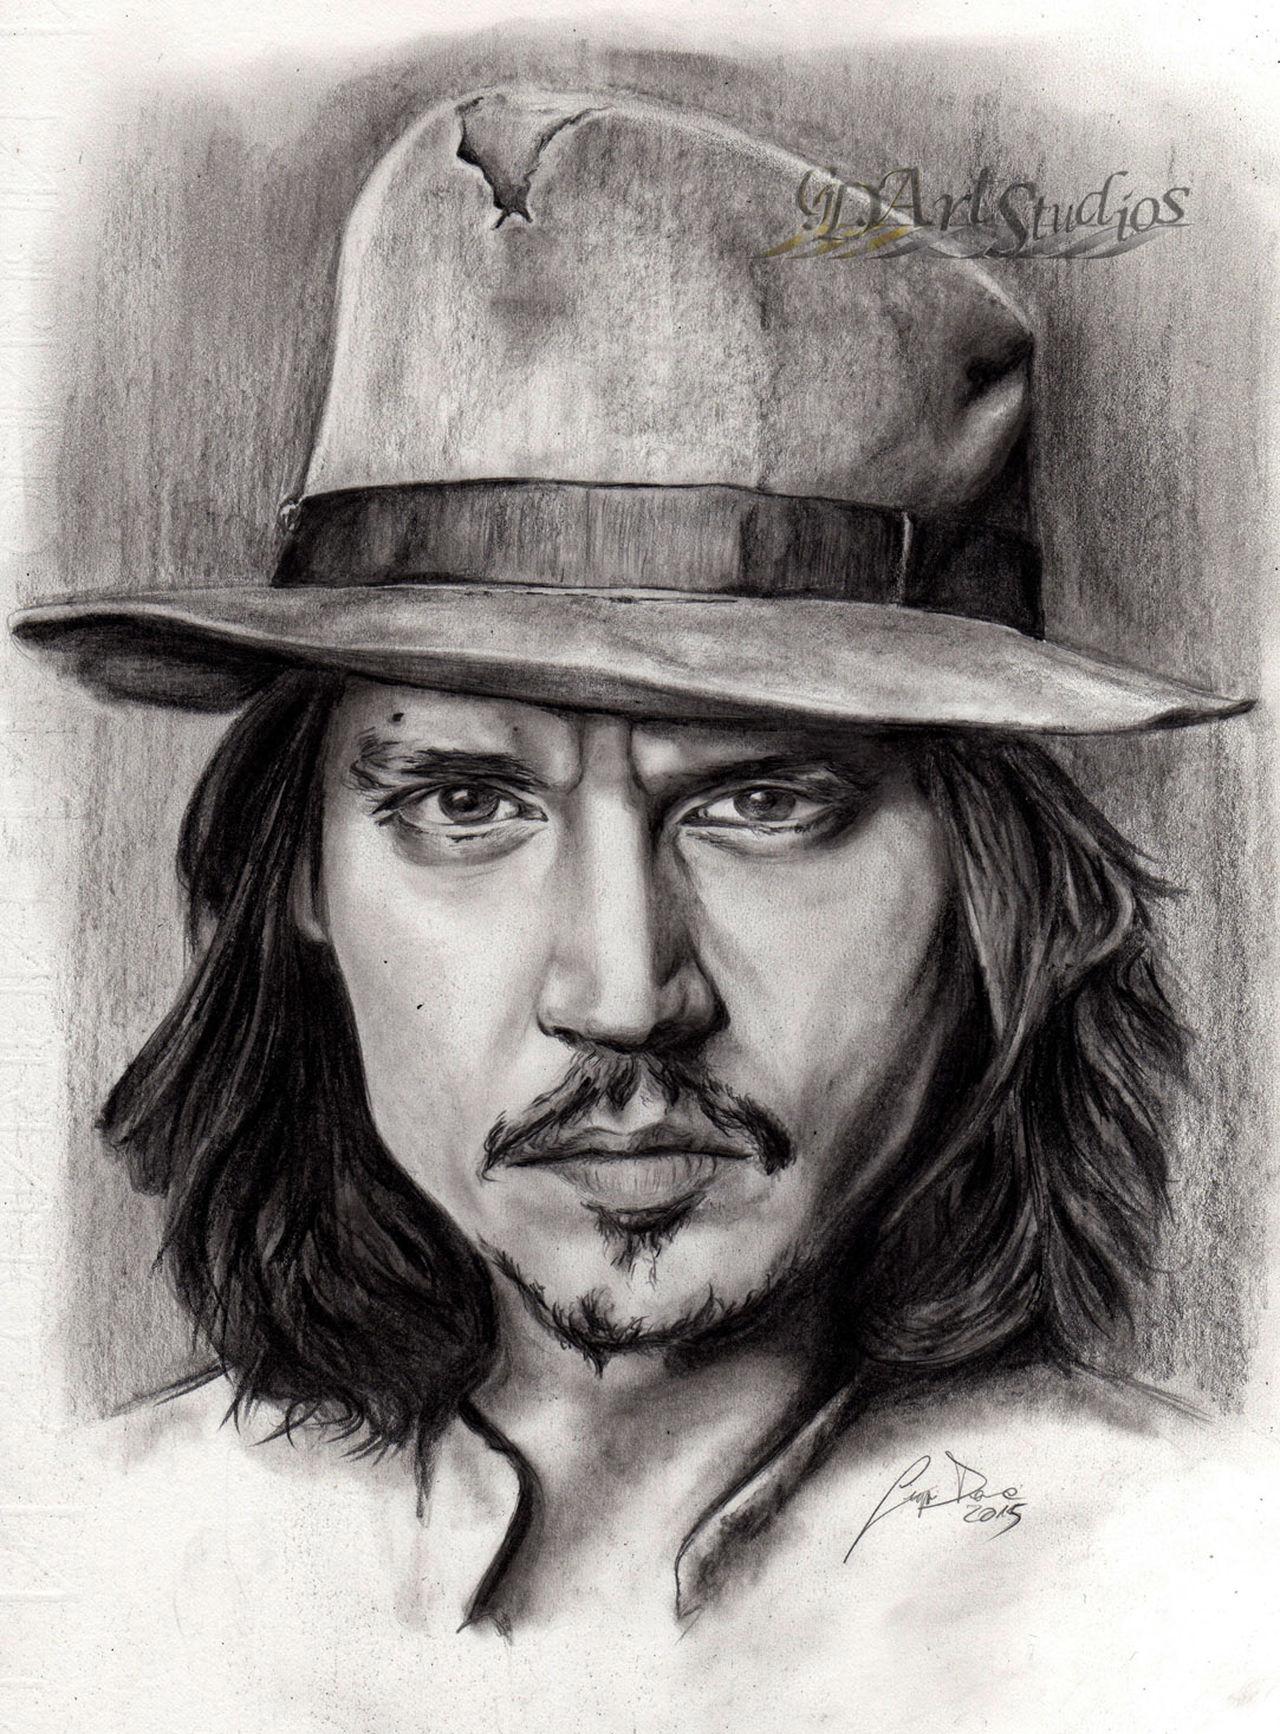 ArtWork Artworks Creativity Drawing Gdartstudios Johnny Depp Johnnydepp Portrait Realistic Ritratto Sketch Sketchbook